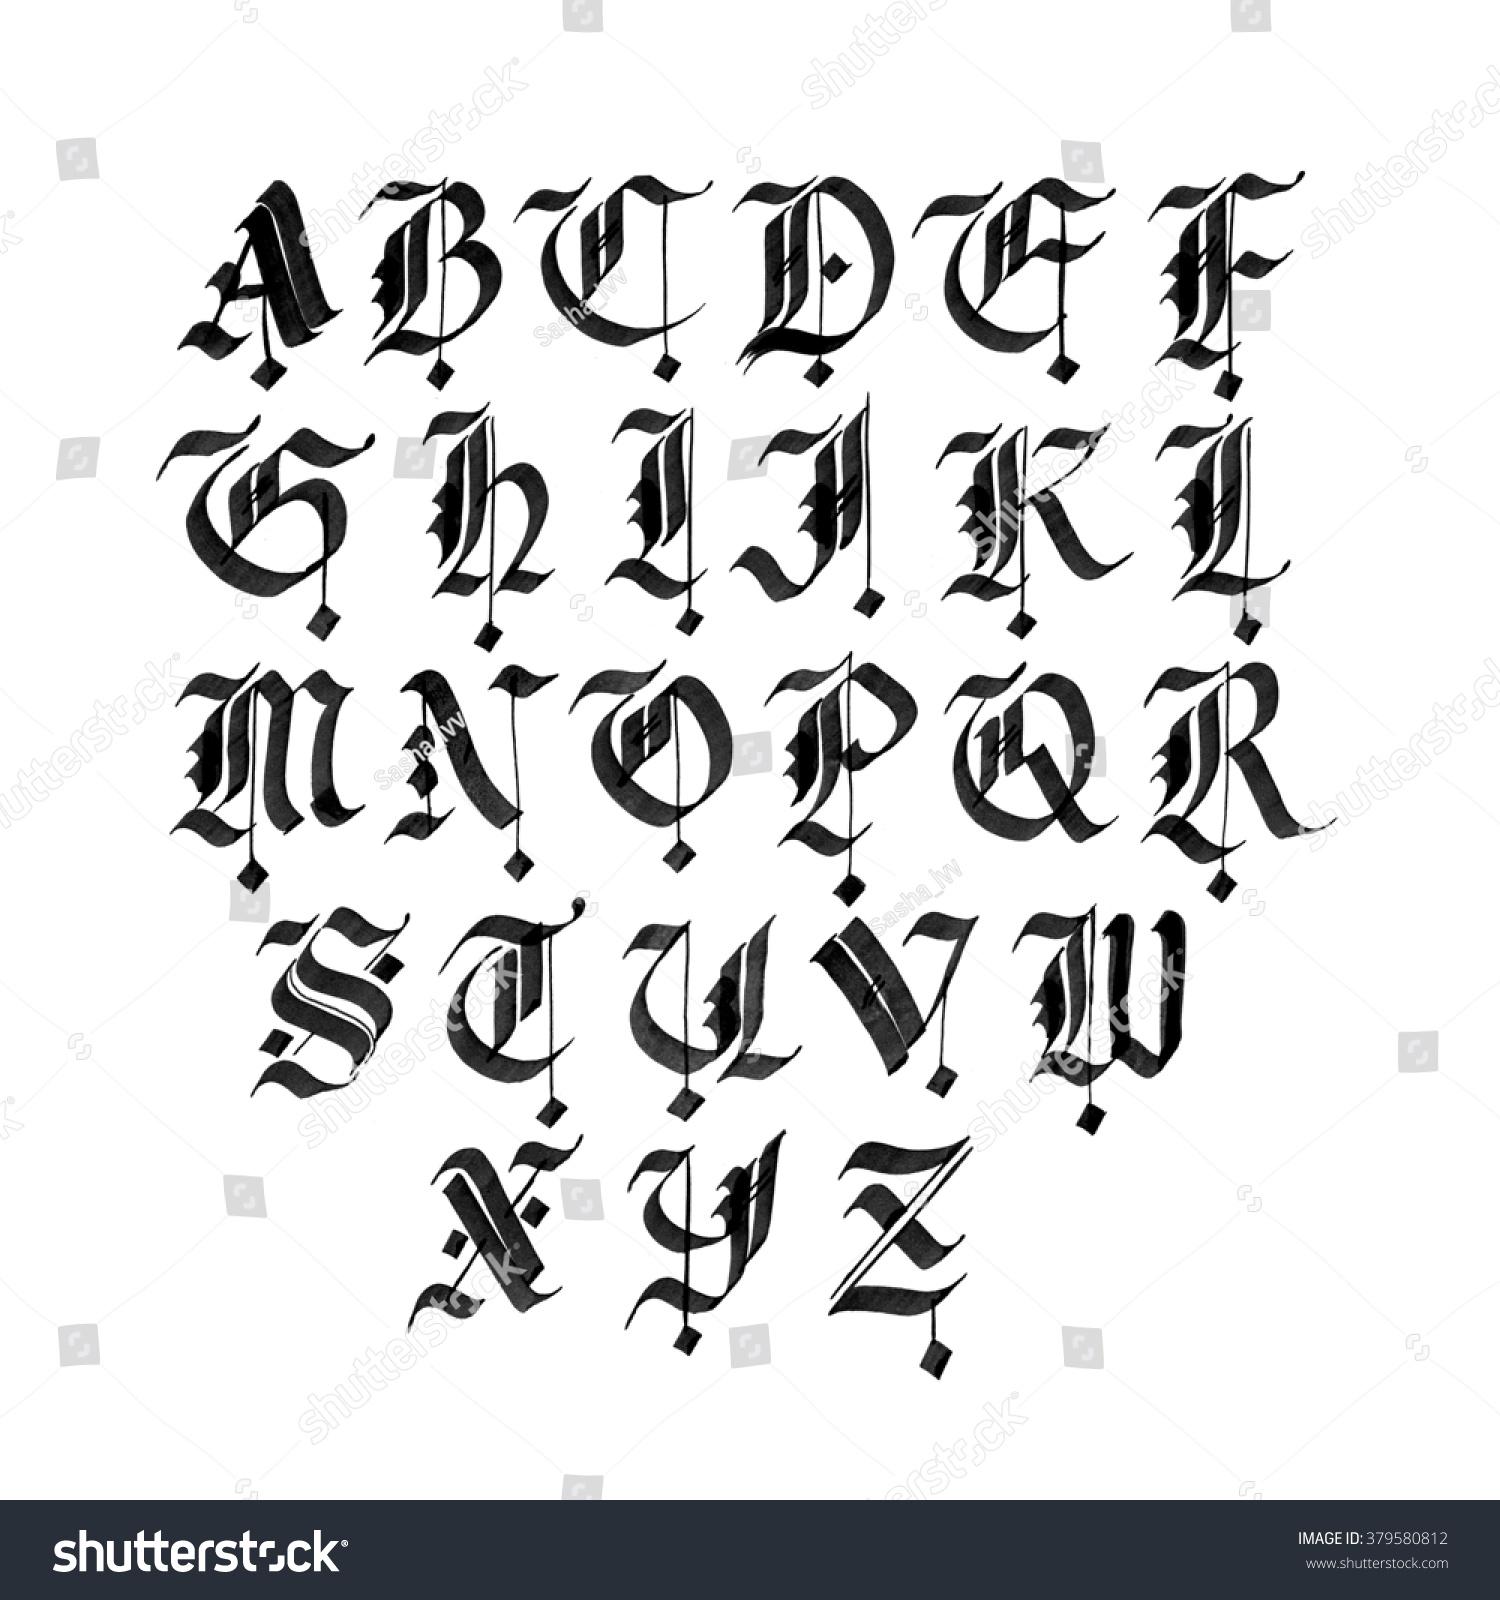 Gothic calligraphy fonts imgkid the image kid